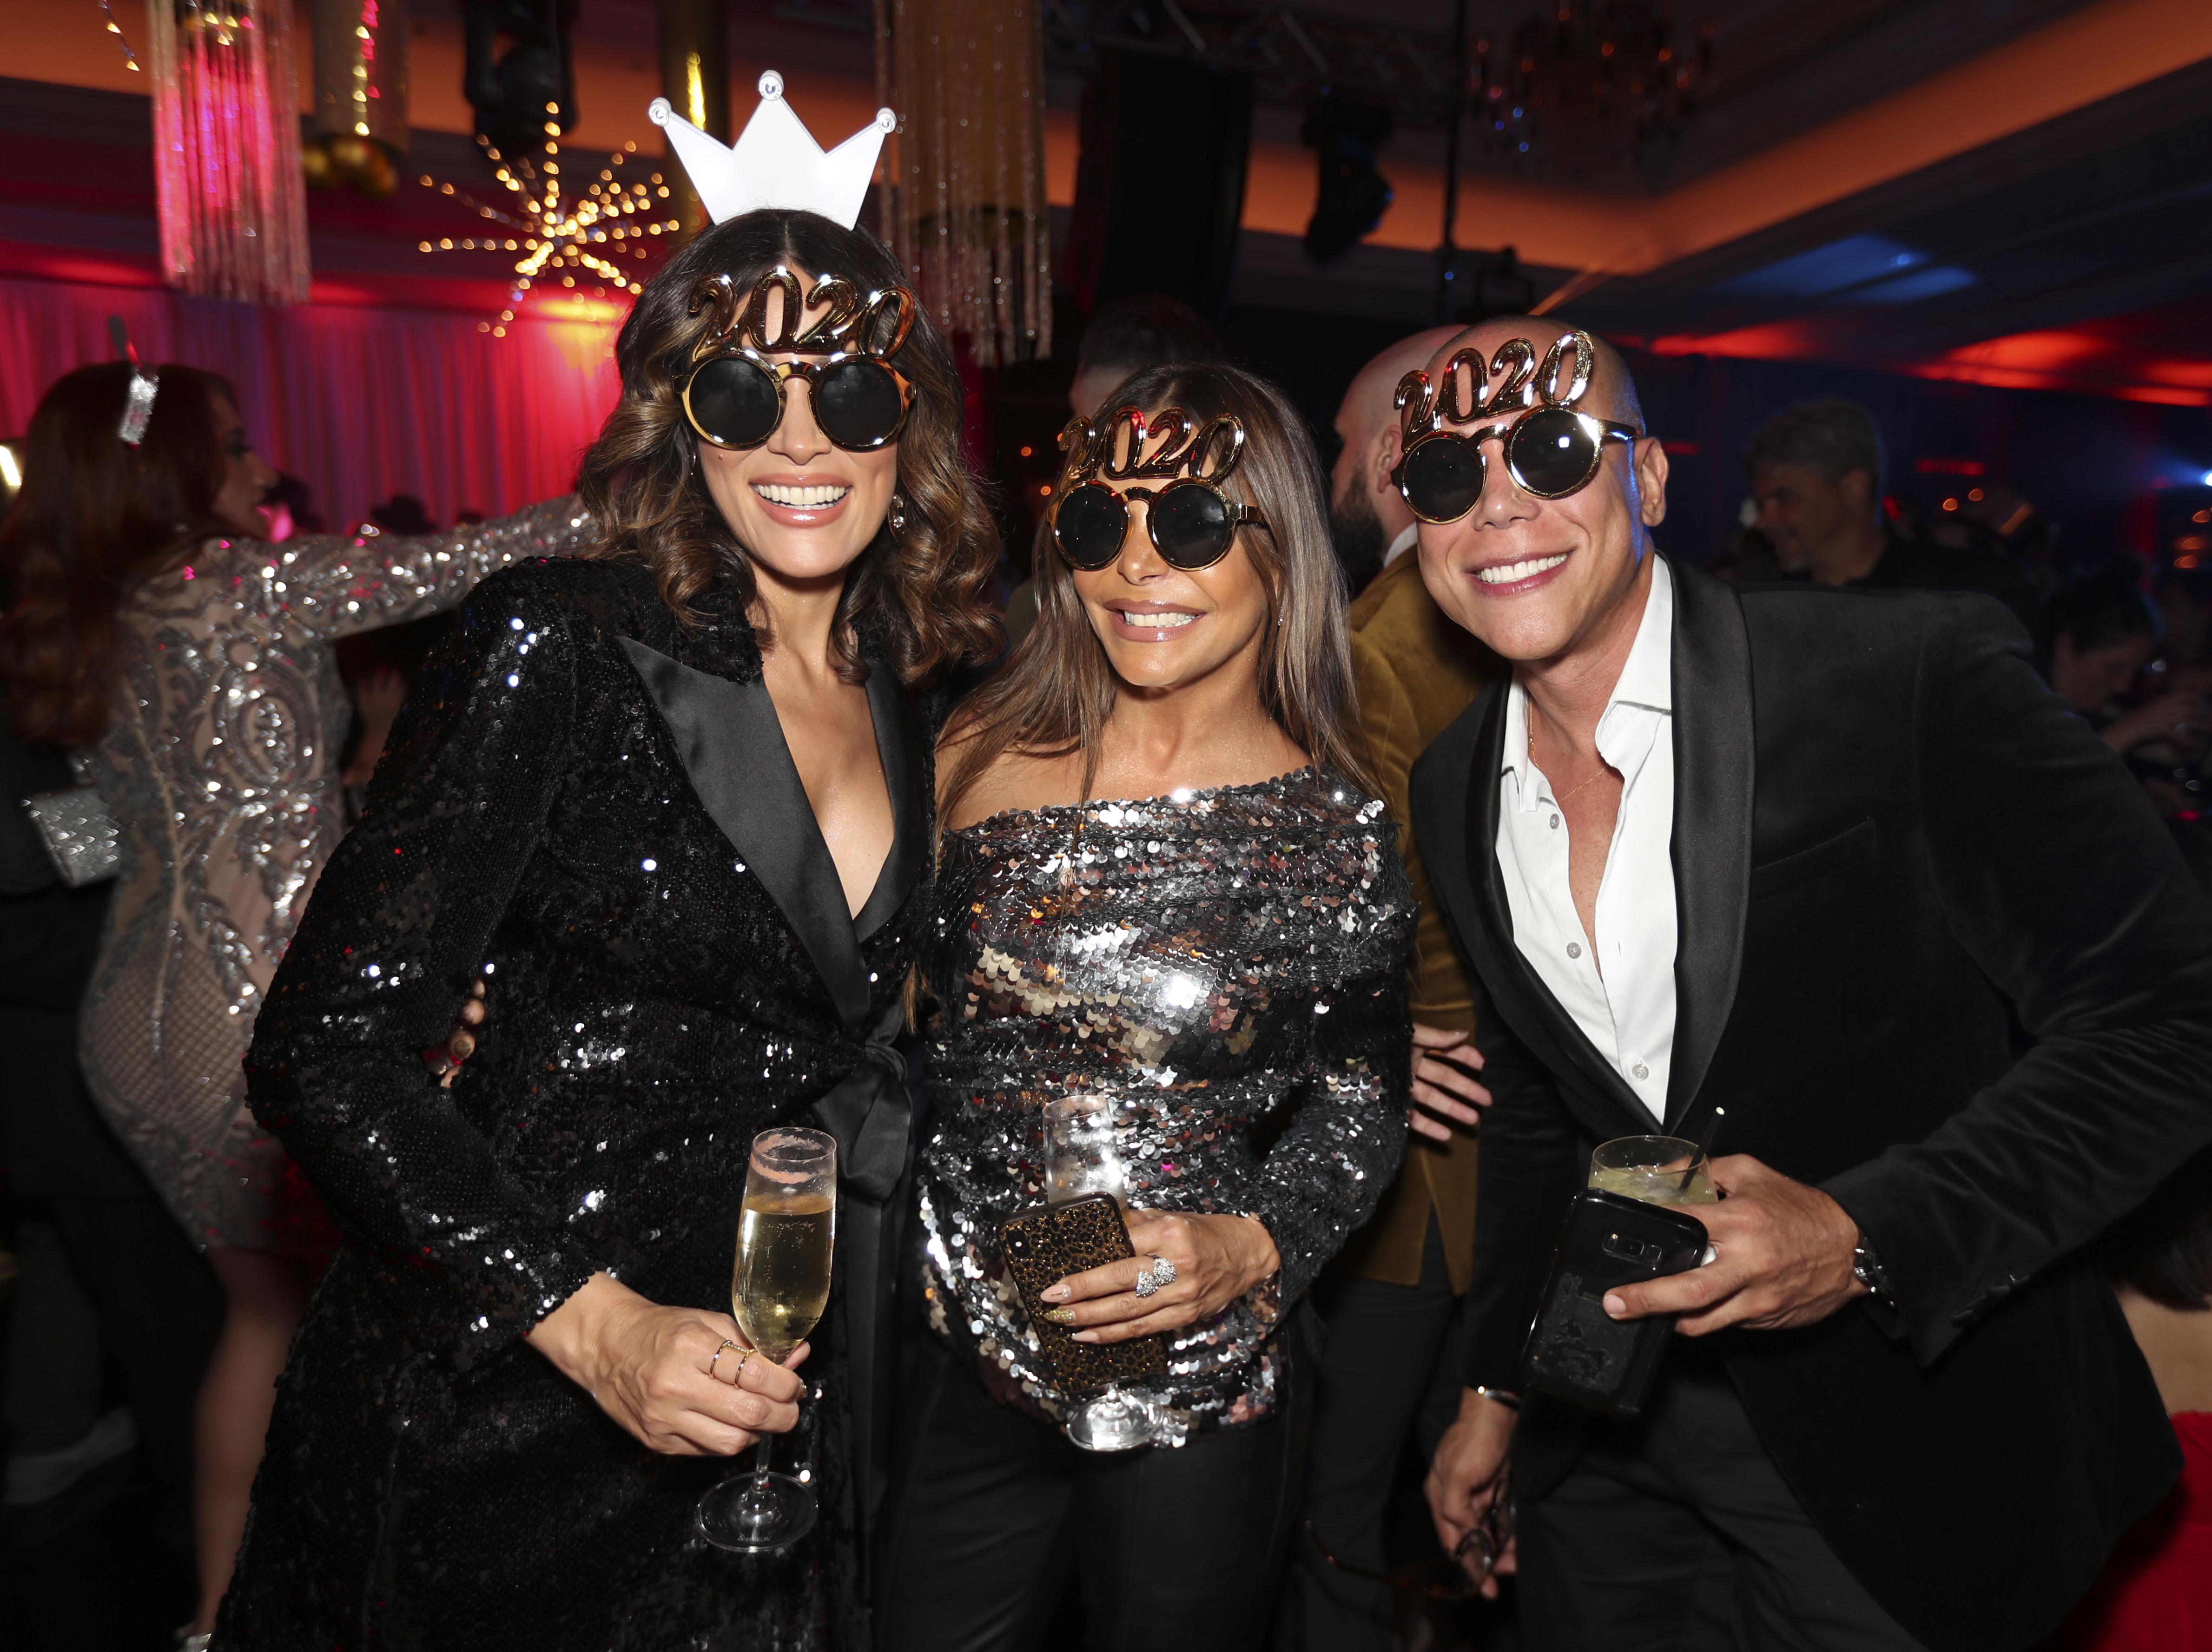 Rosalina Torres, Wanda Malva y Juan Saure. (Suministrada)